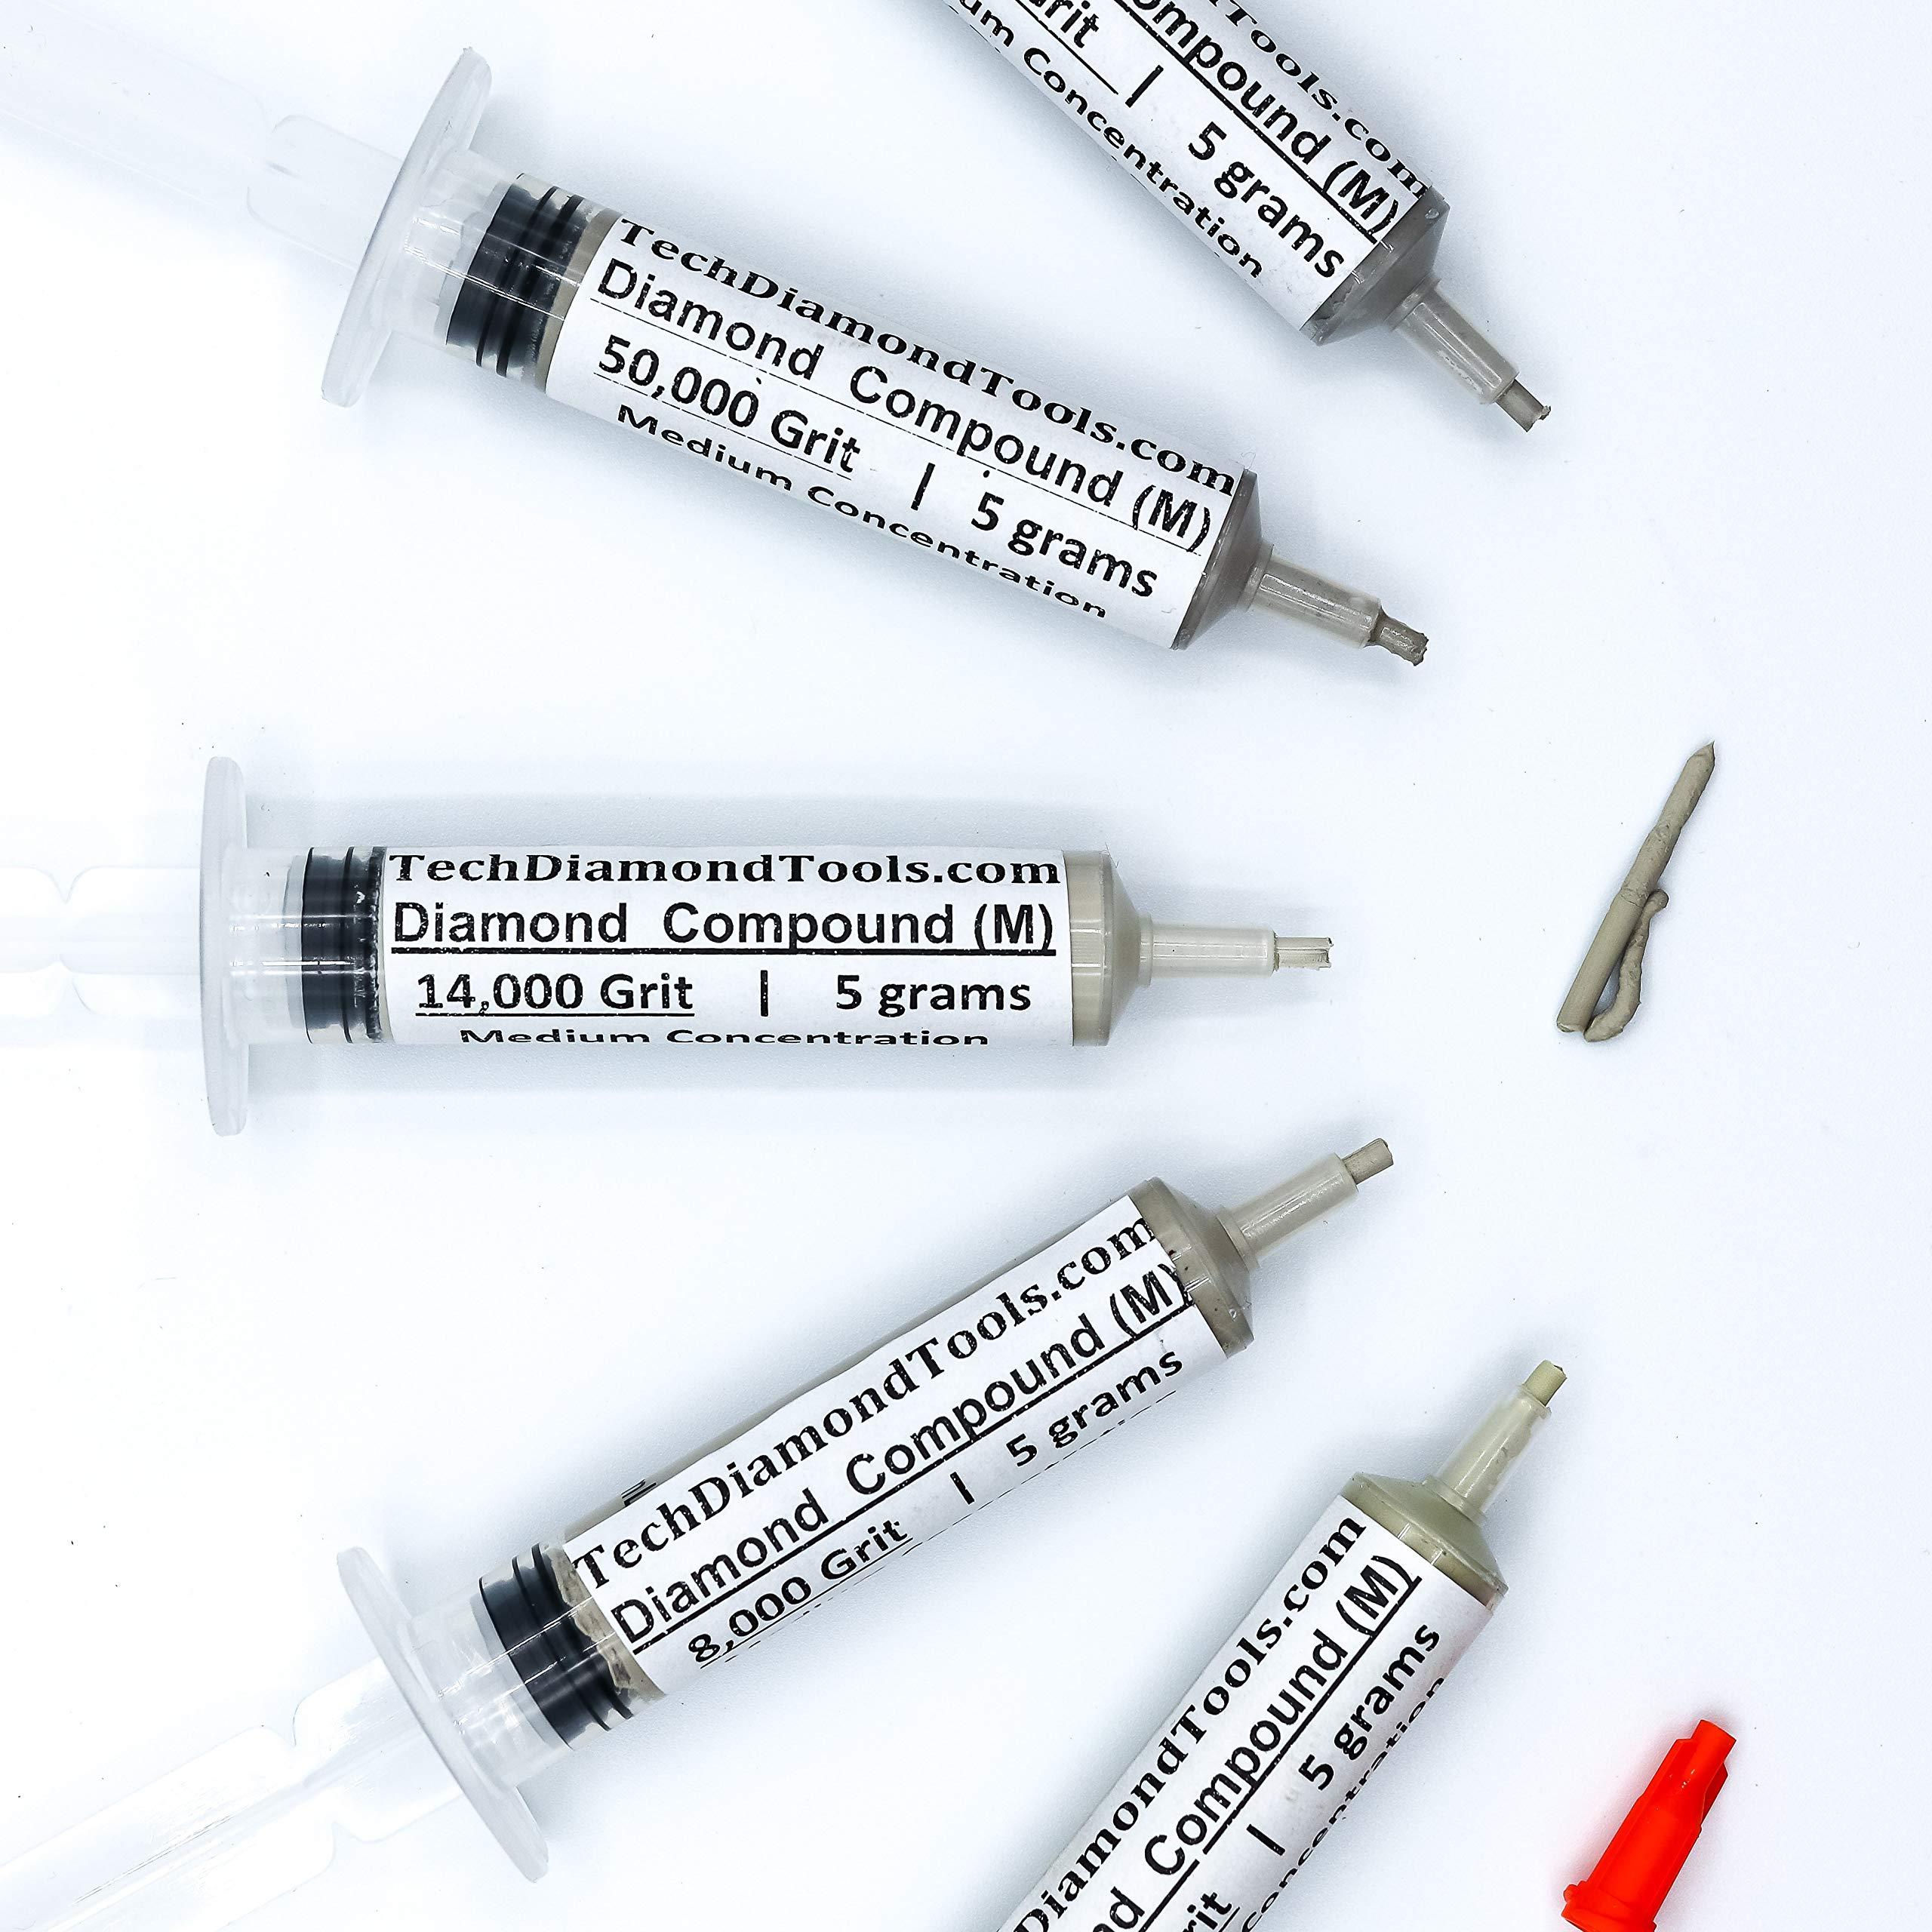 TechDiamondTools Diamond Polishing Paste Set of 5 Syringes X 5 Grams (M), Polishing Finishing Compound, Sizes 5000 8000 14000 50000 100000 Grit Mesh - With Medium(25%) Concentration of Diamond Powders